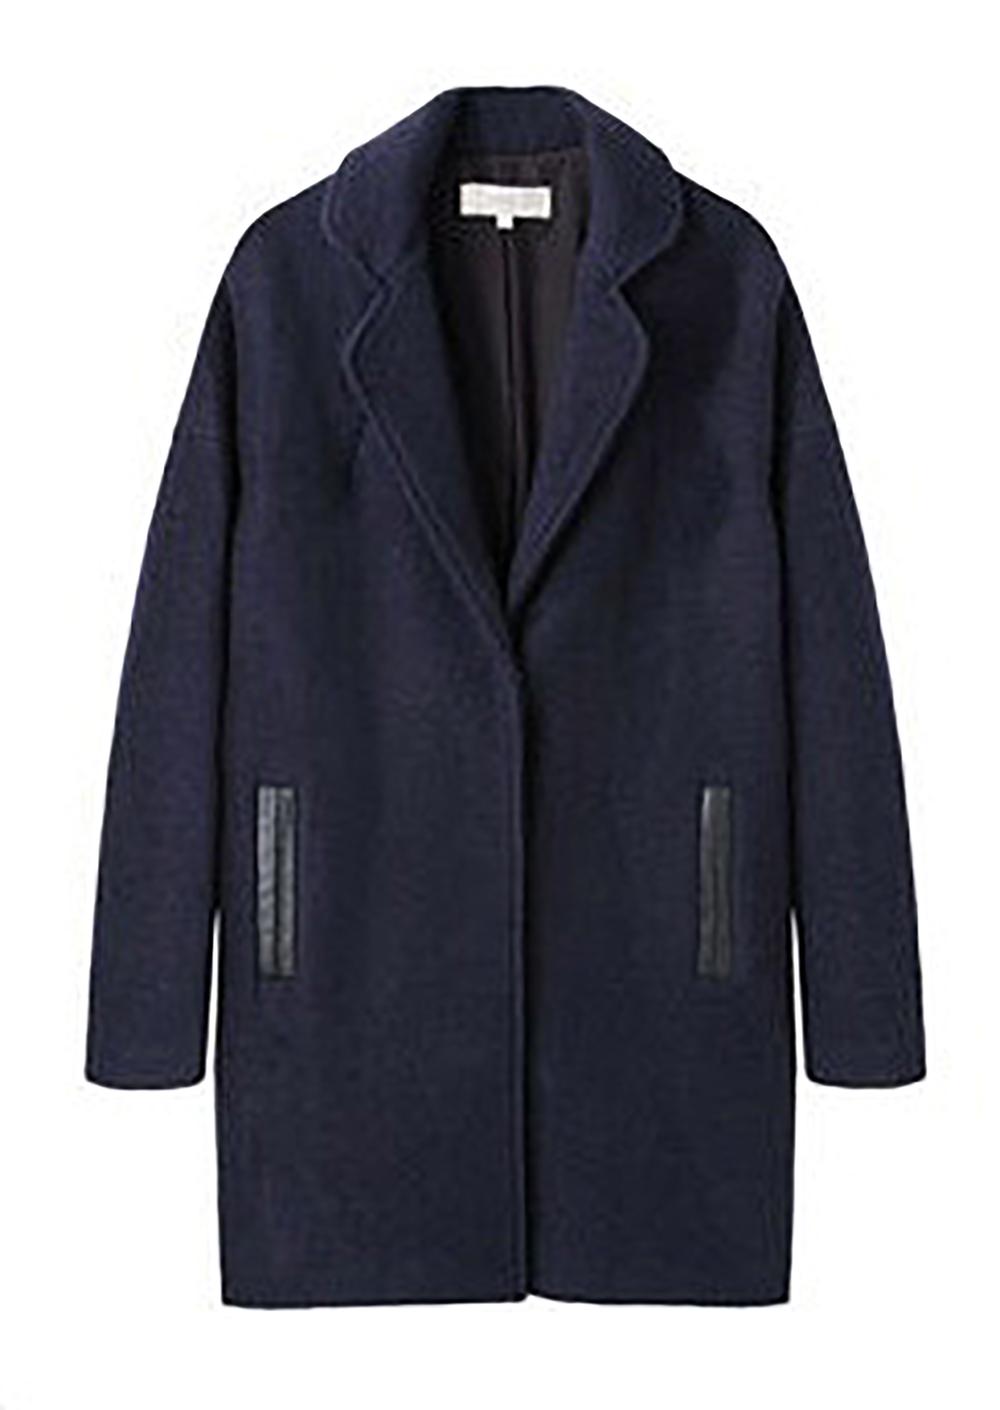 Vanessa Bruno Athe boiled wool coat resized.jpg